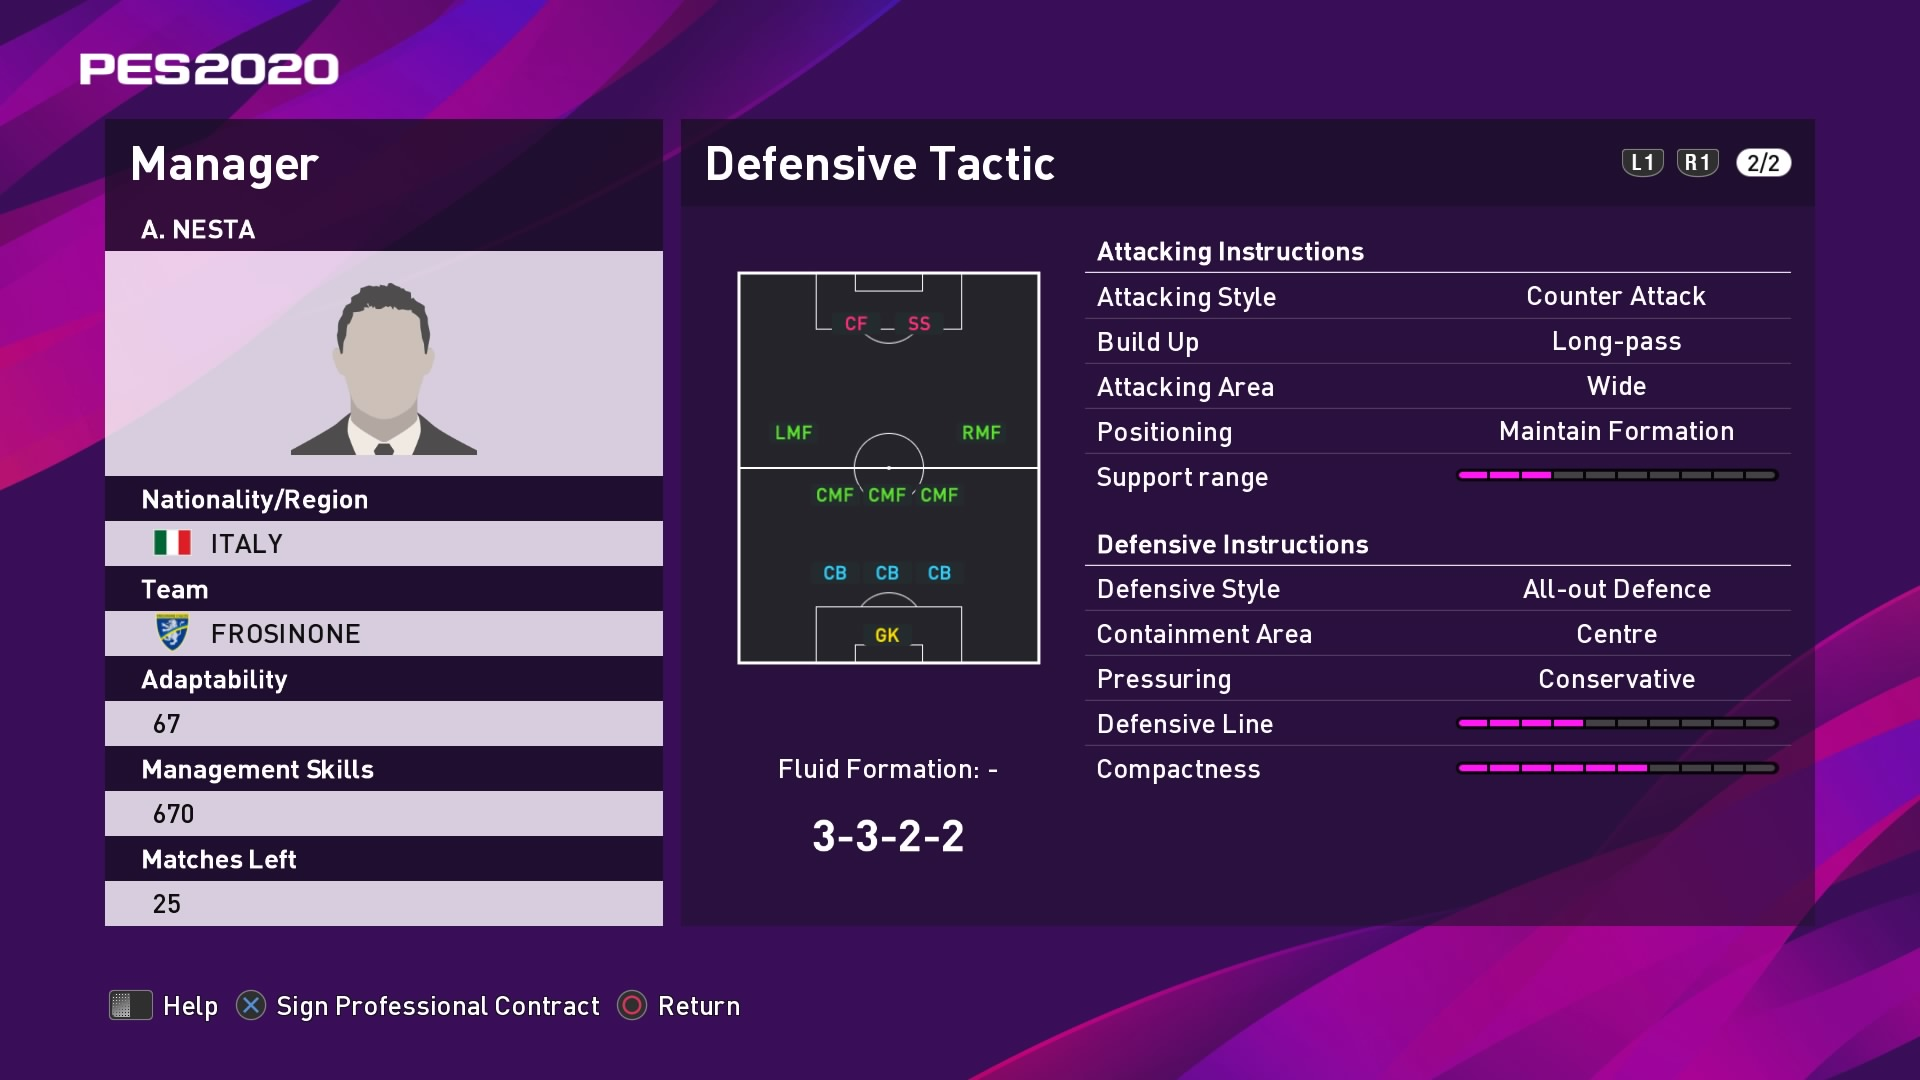 A. Nesta (Alessandro Nesta) Defensive Tactic in PES 2020 myClub